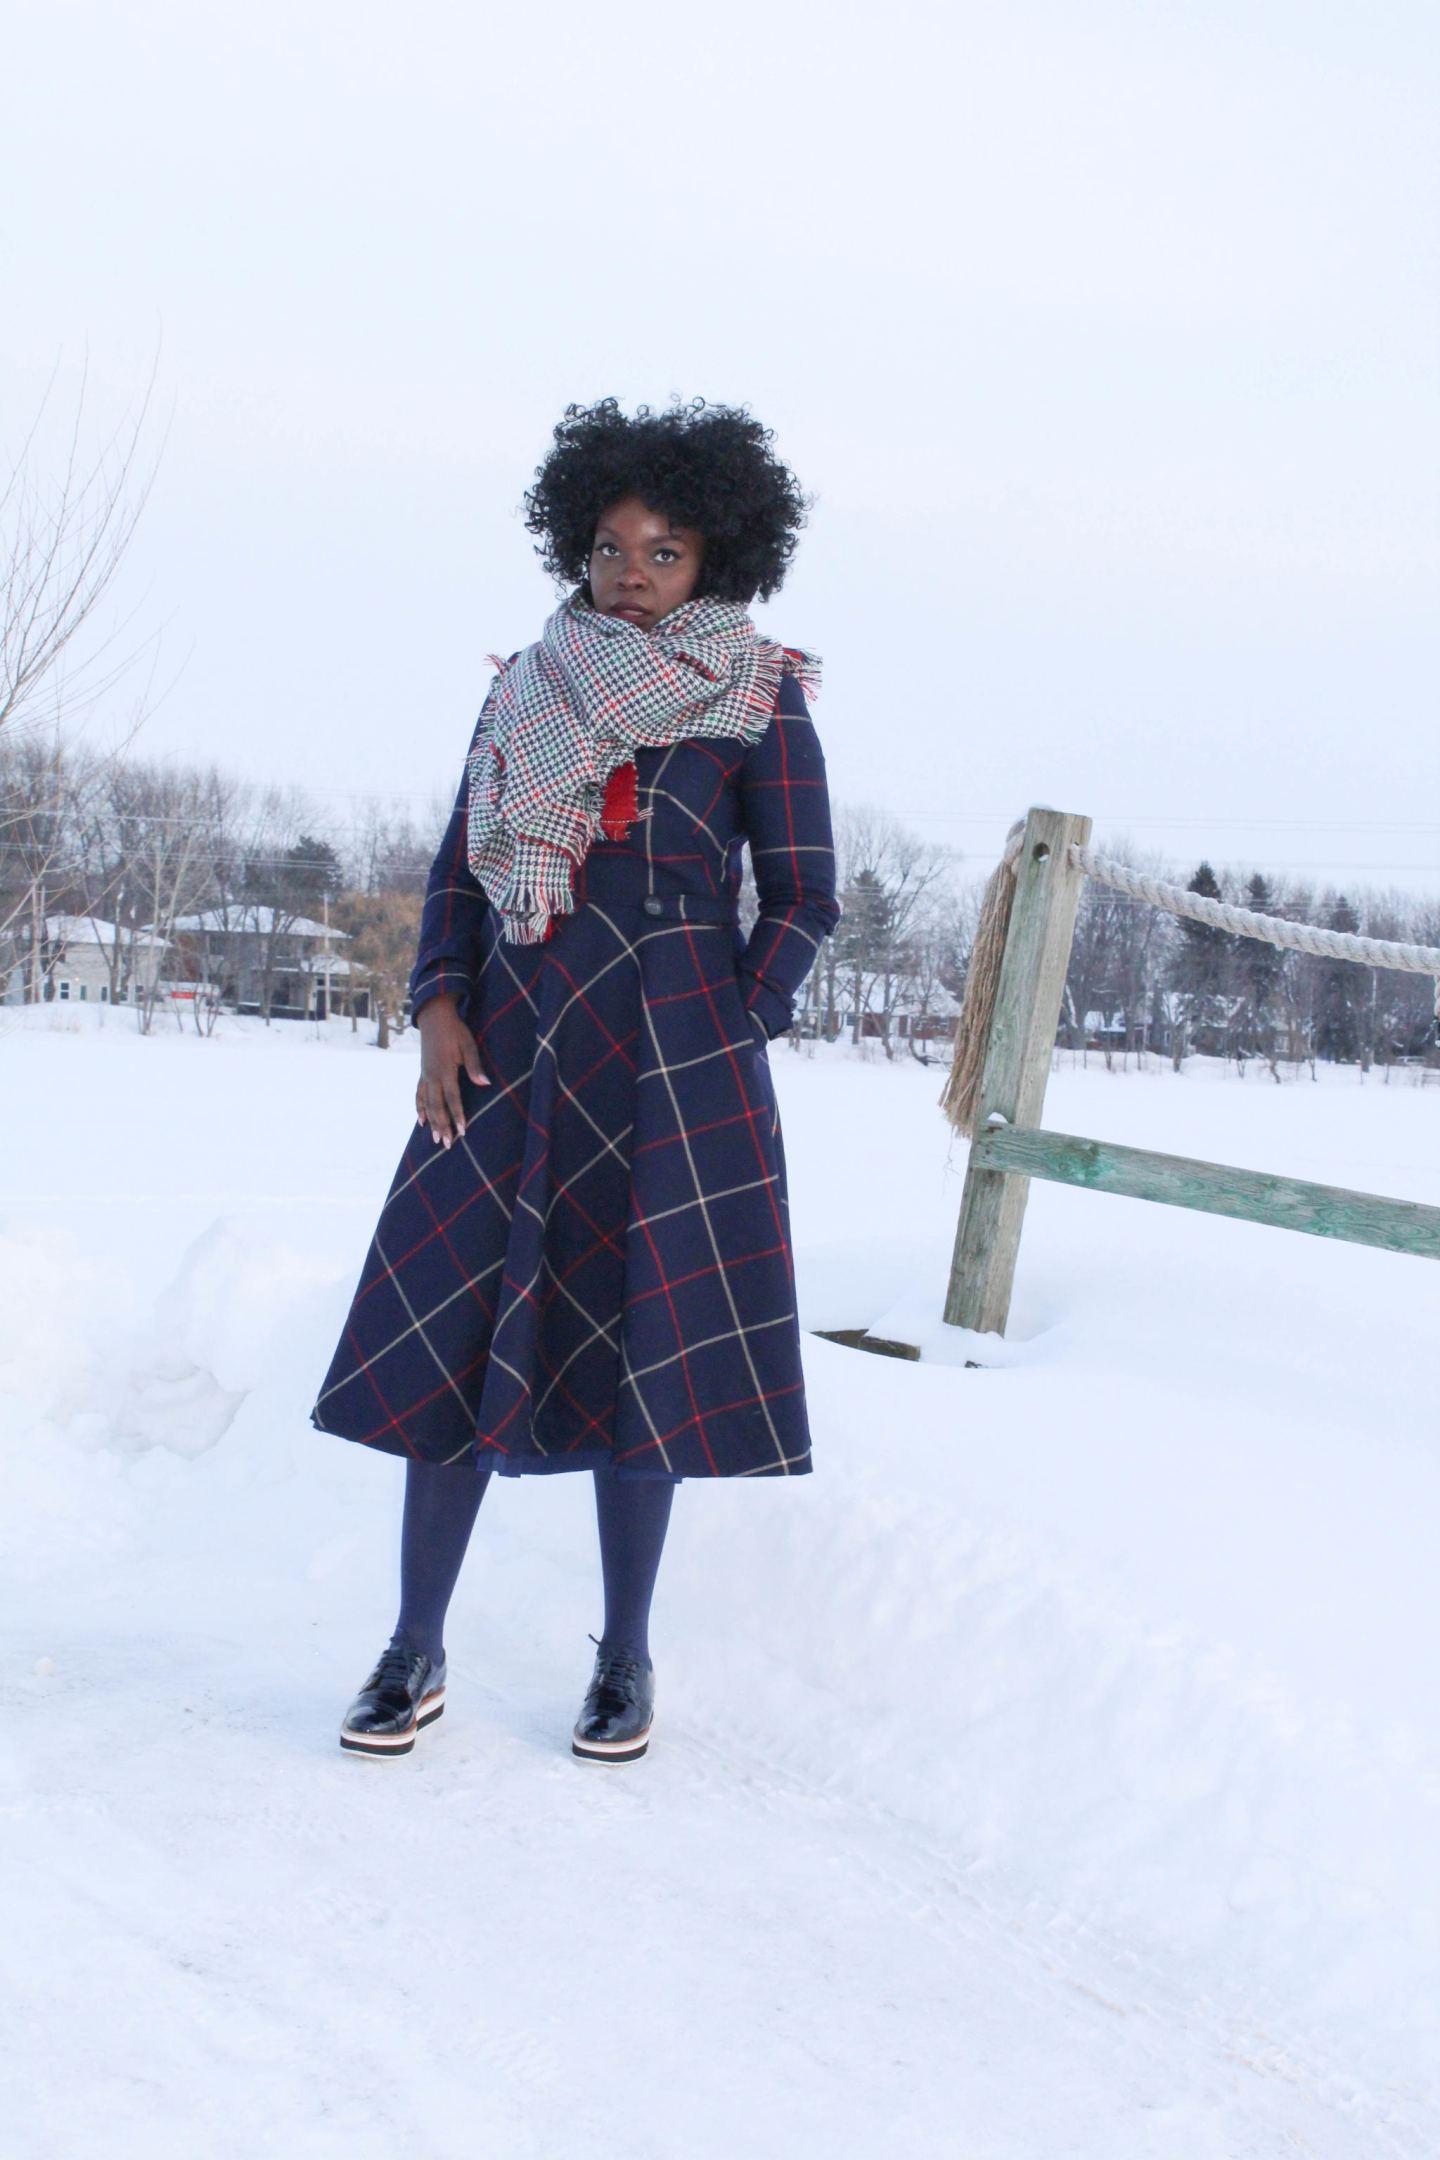 Tweed Dress in Montreal